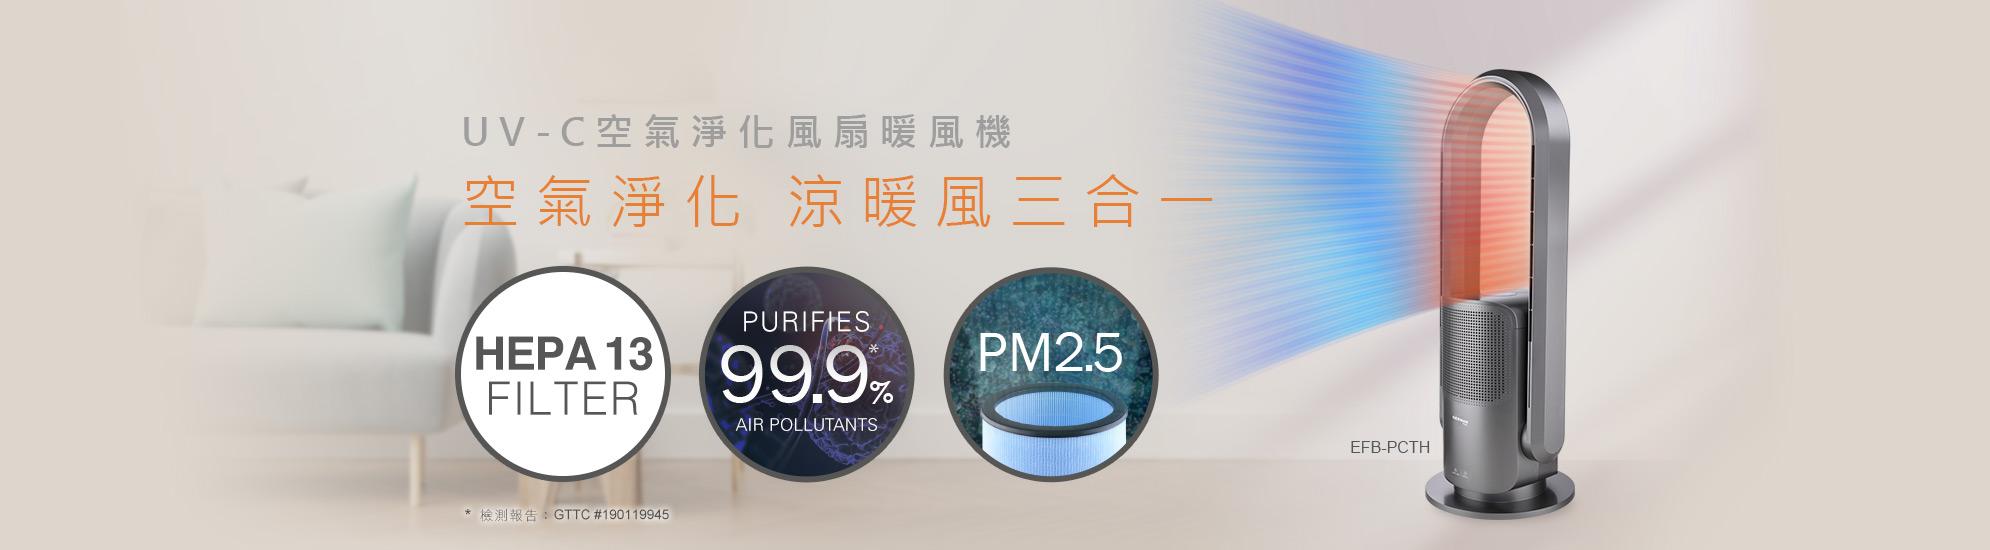 UV-C空氣淨化風扇暖風機